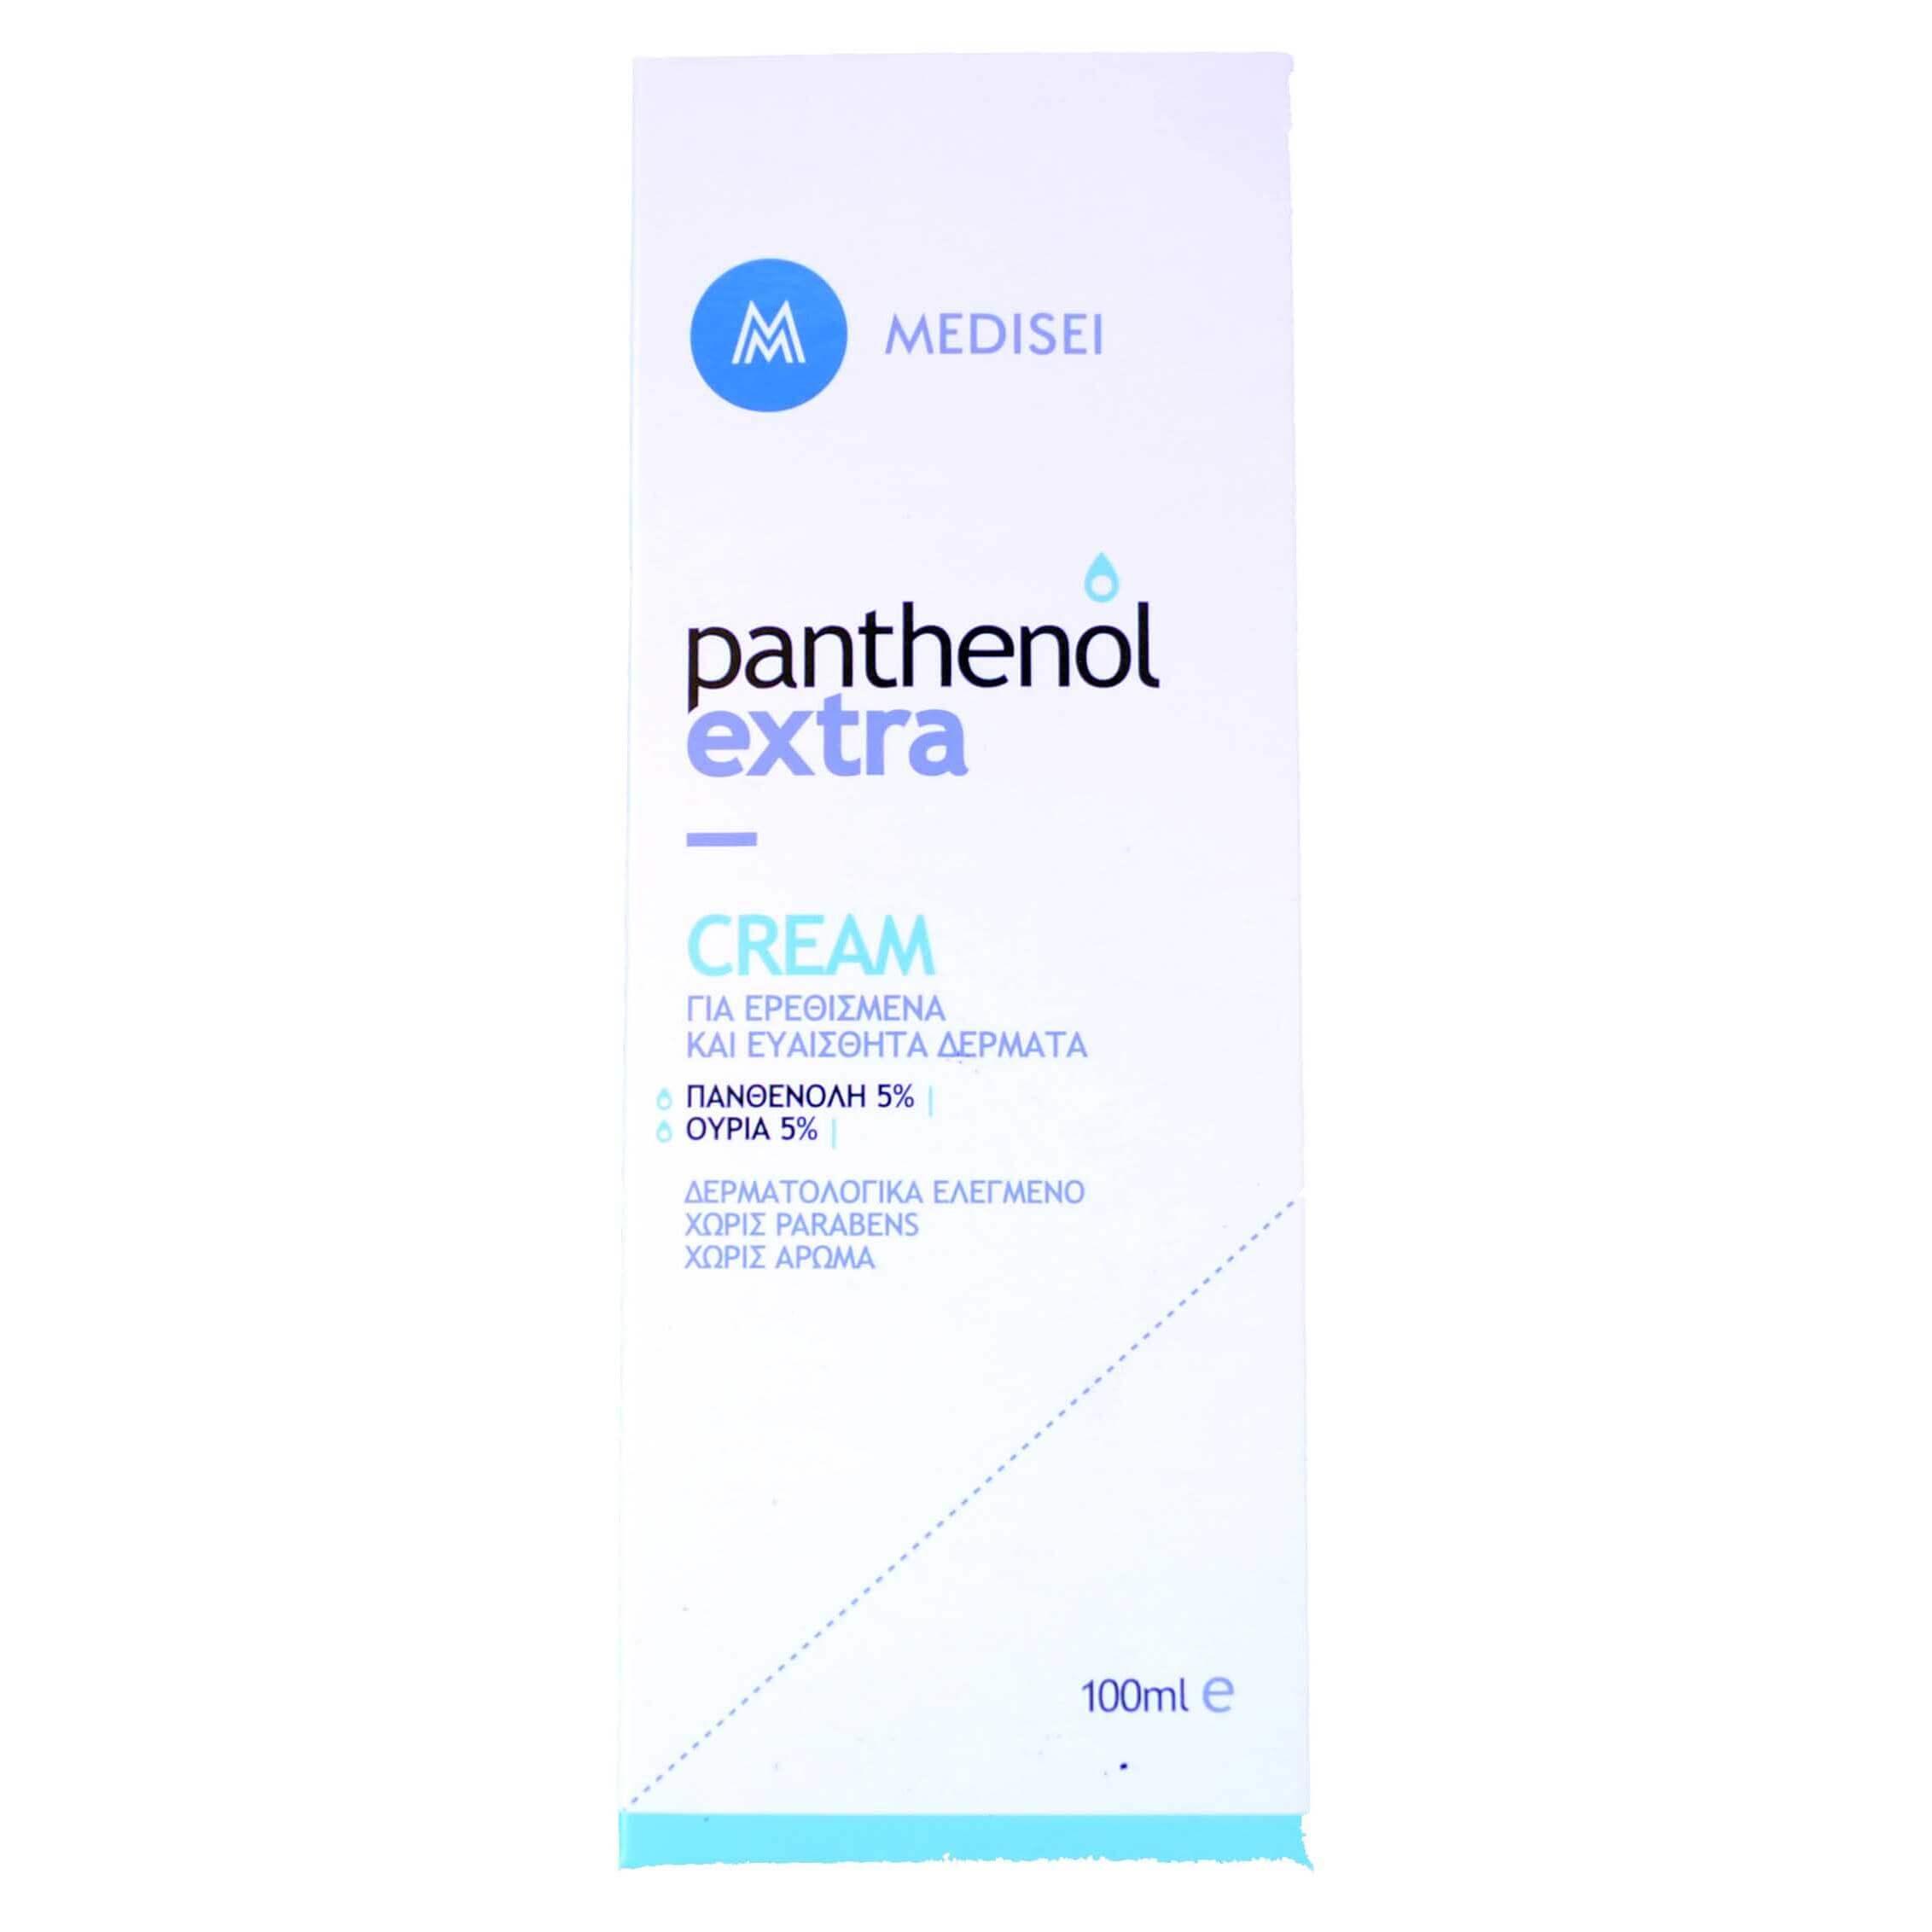 Medisei Panthenol Extra 5% Urea Ενυδατώνει Έντονα την Επιδερμίδα & Επιταχύνει Ανάπλασή της 100gr